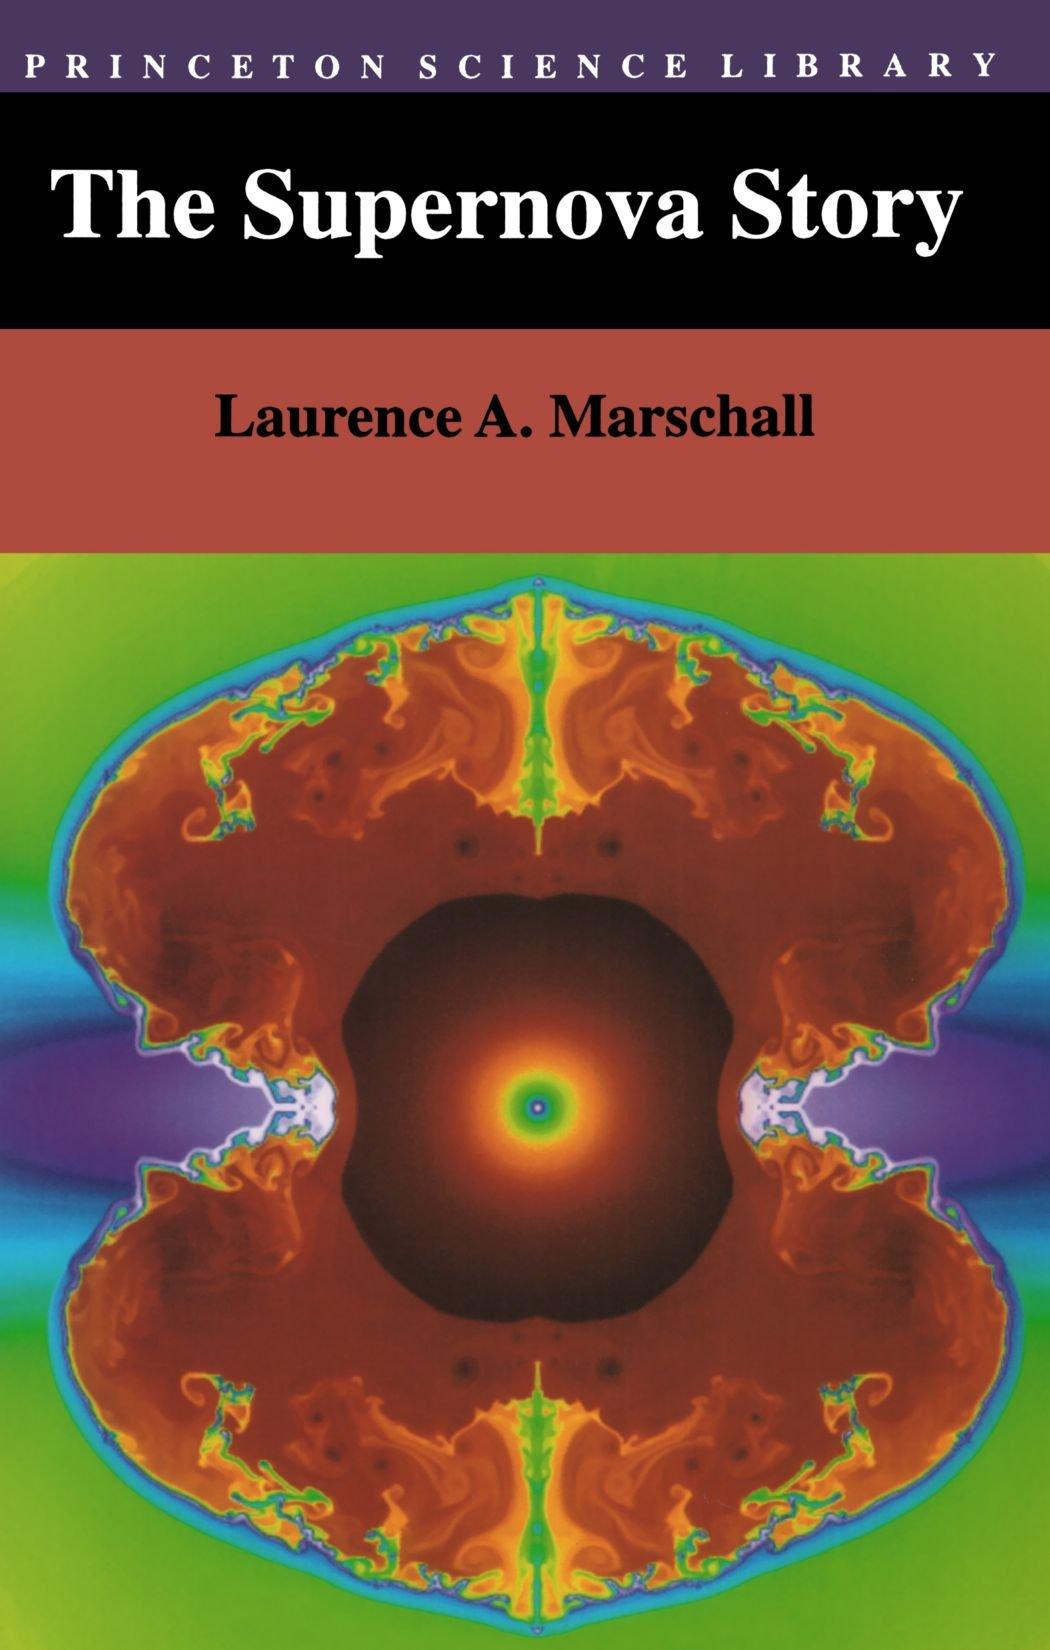 the supernova story princeton science library